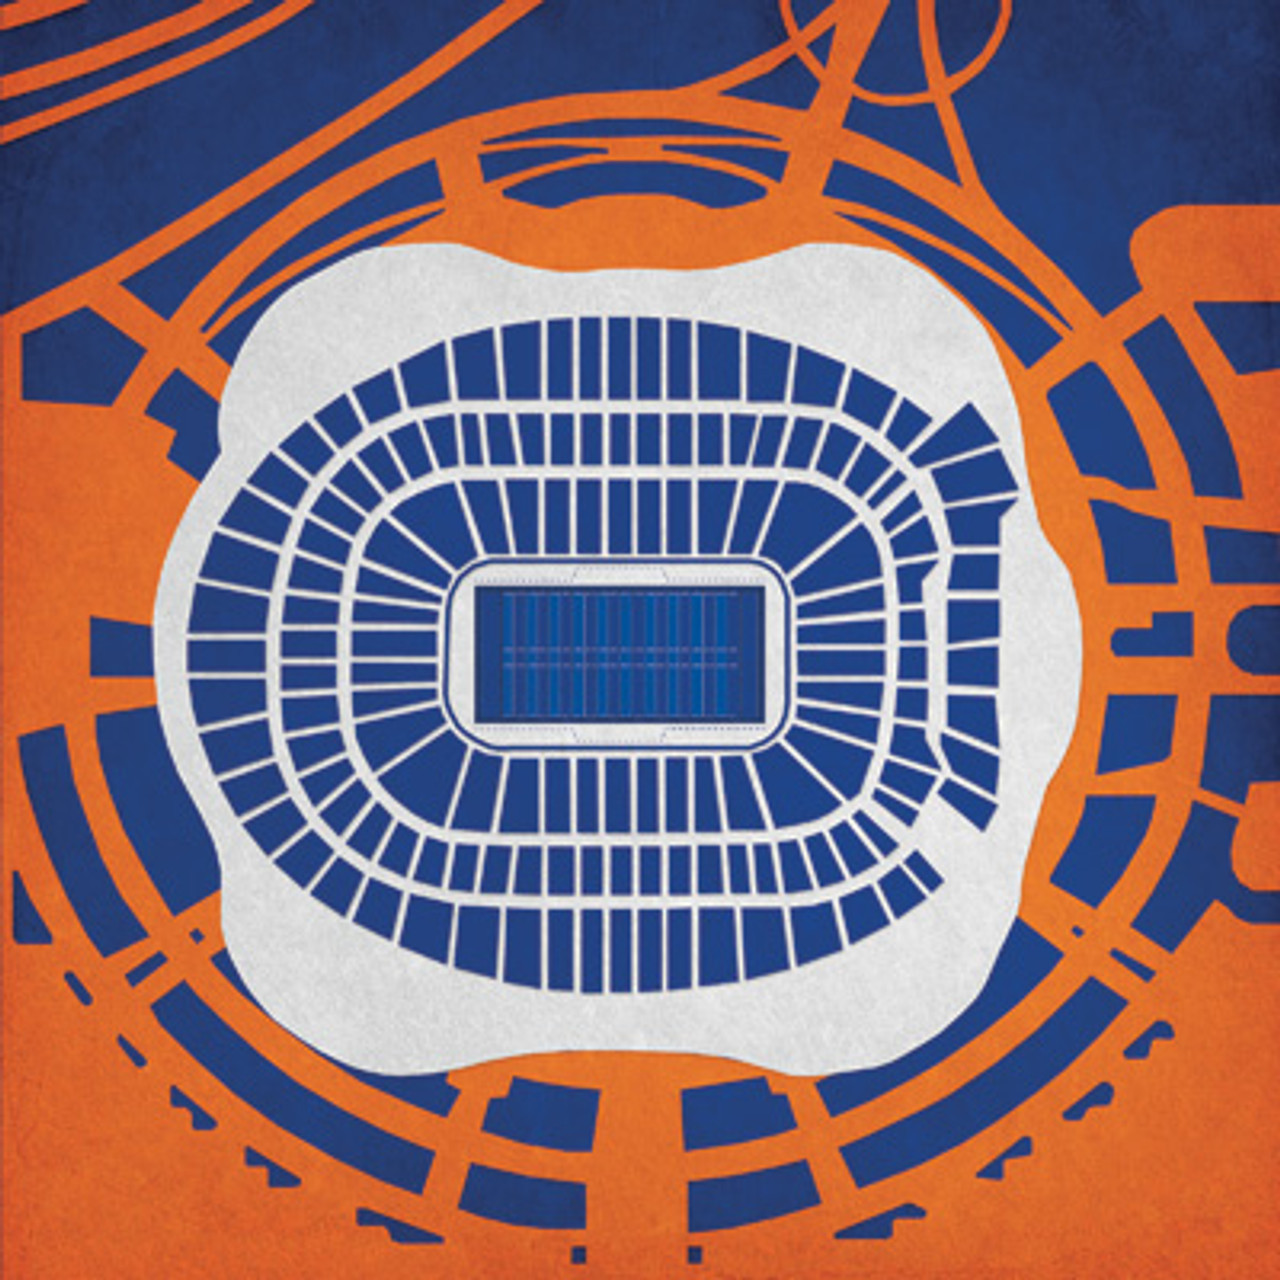 Sports Authority Field - Denver Broncos City Print